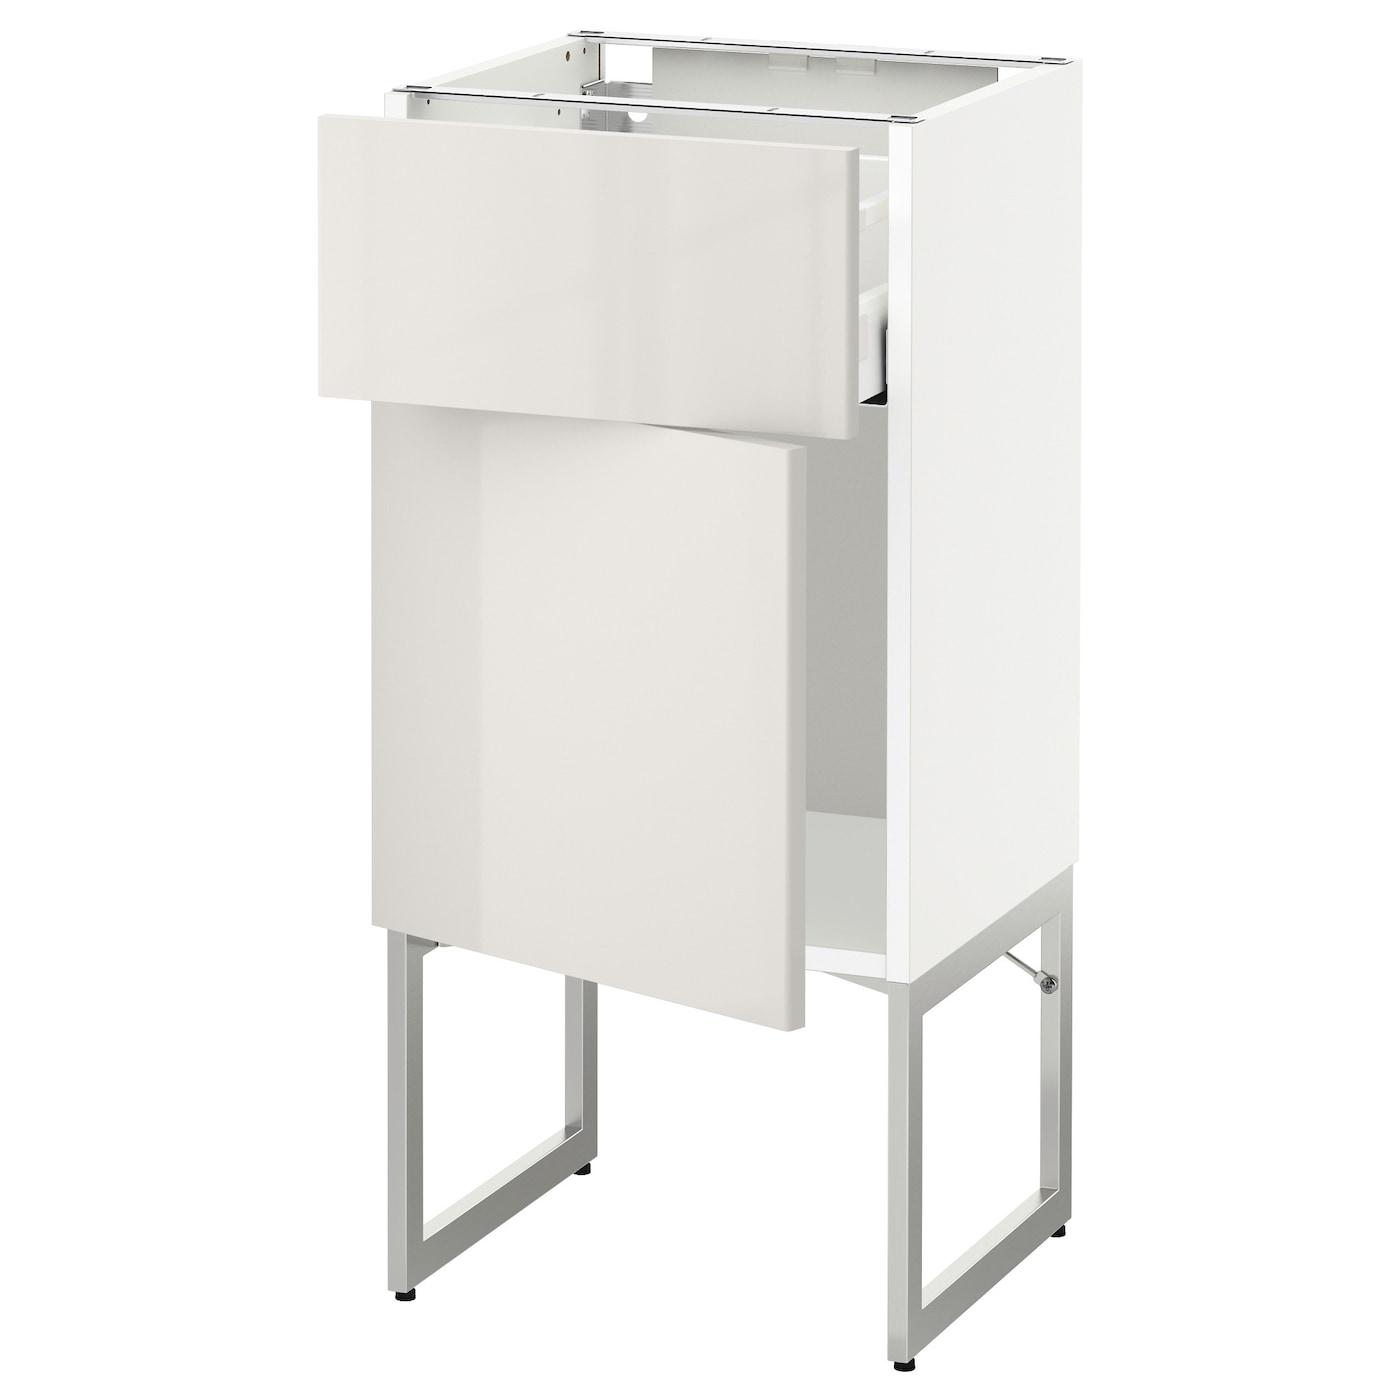 metod maximera base cabinet with drawer door white ringhult light grey 40x37x60 cm ikea. Black Bedroom Furniture Sets. Home Design Ideas